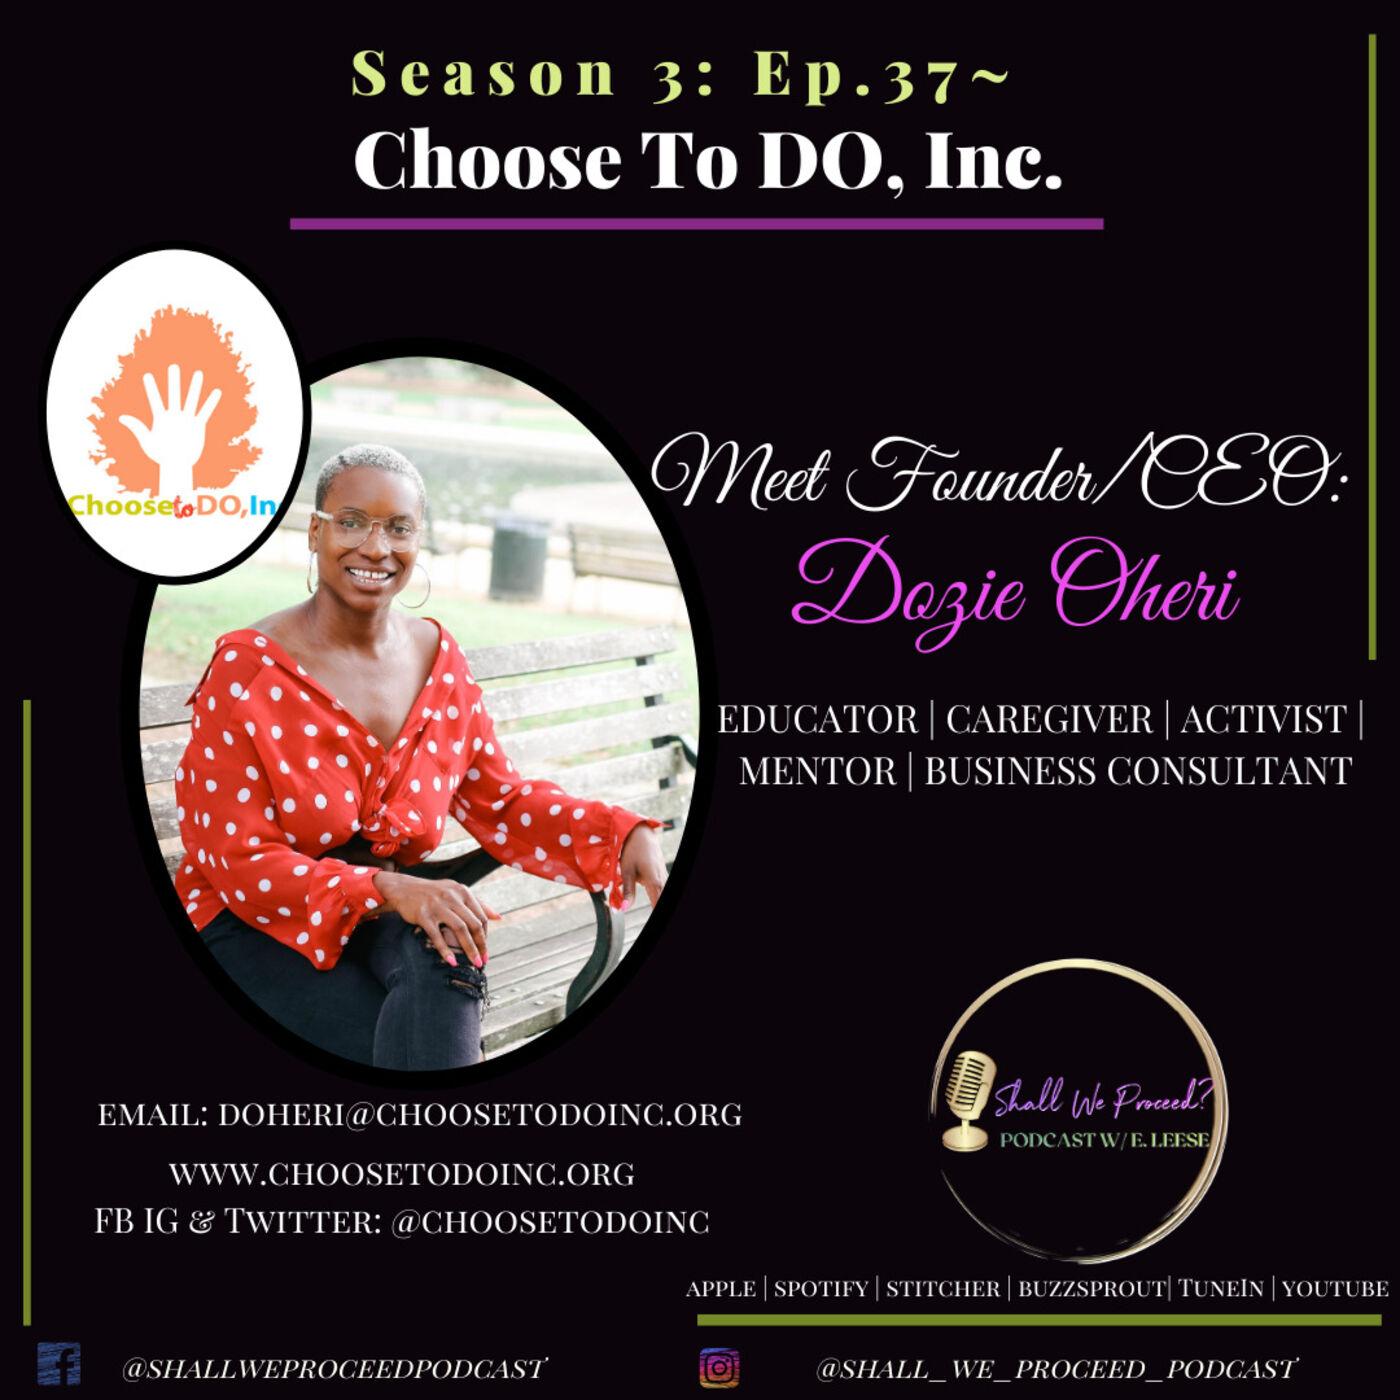 S3 Ep. 37 ~ Choose To DO, INC. w/ Founder & CEO Dozie Oheri